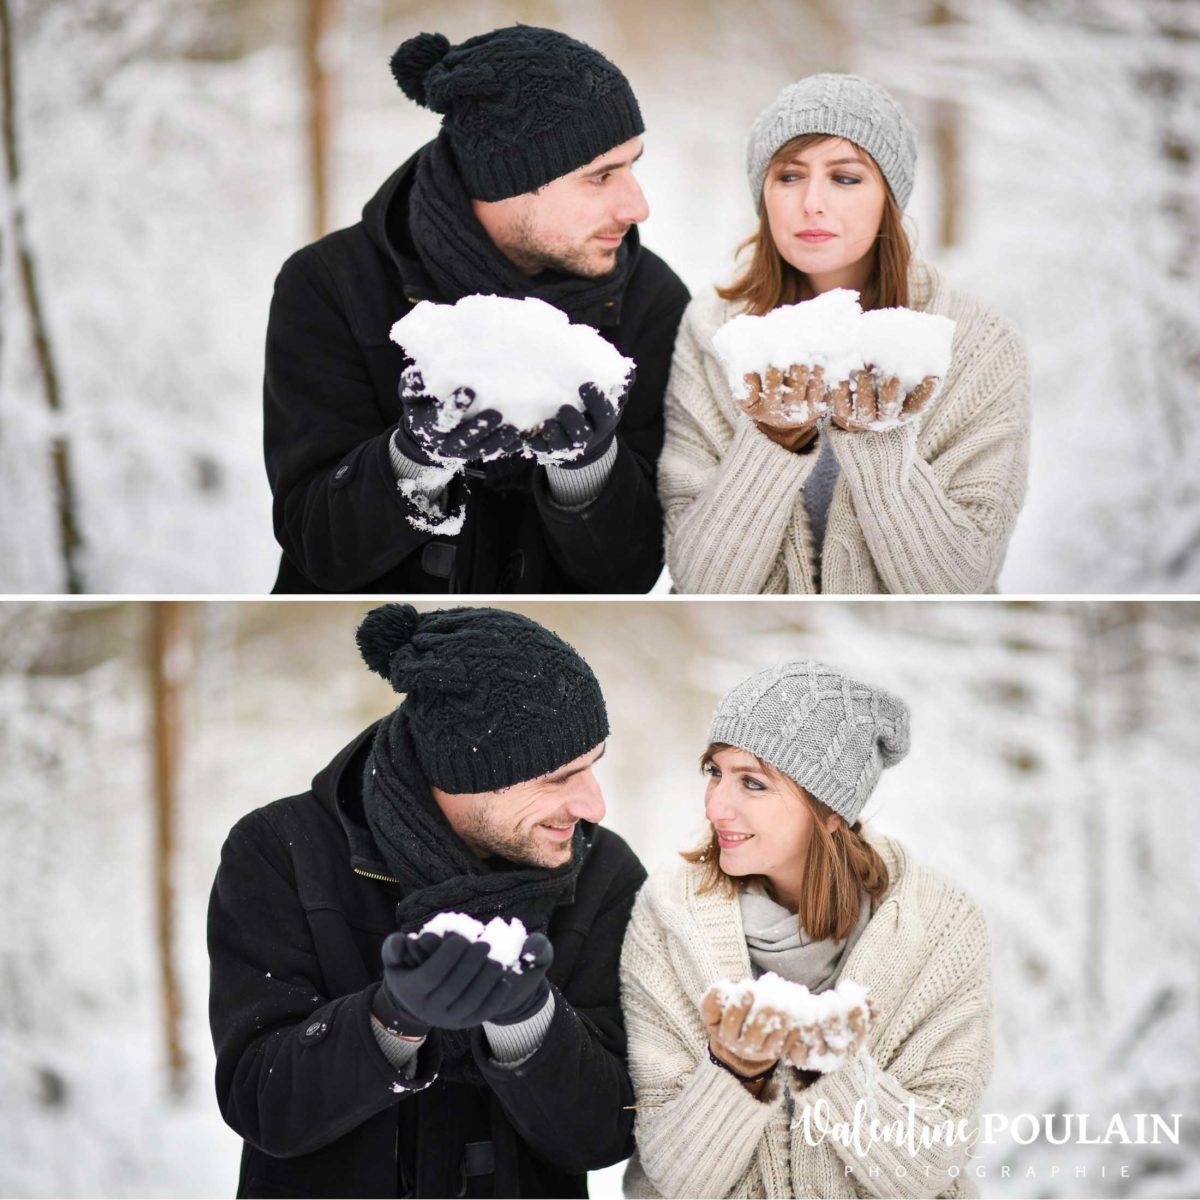 Shooting couple hivernal - Valentine Poulain regard